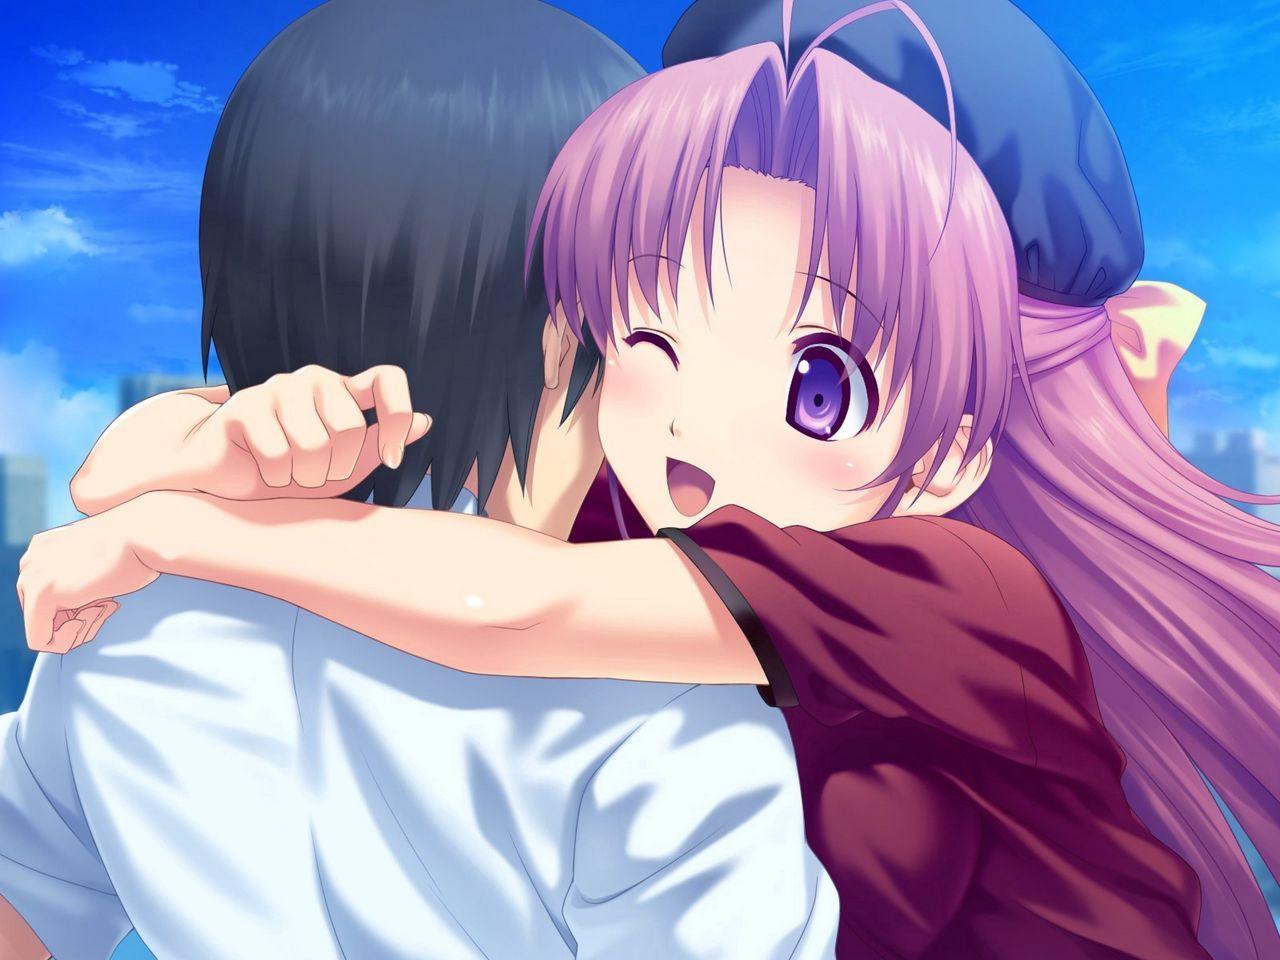 Wallpaper Boy Spin Girl Pleasure Hug In 2021 Anime Wallpaper Download Anime Hug Hd Anime Wallpapers Anime couple hug wallpaper